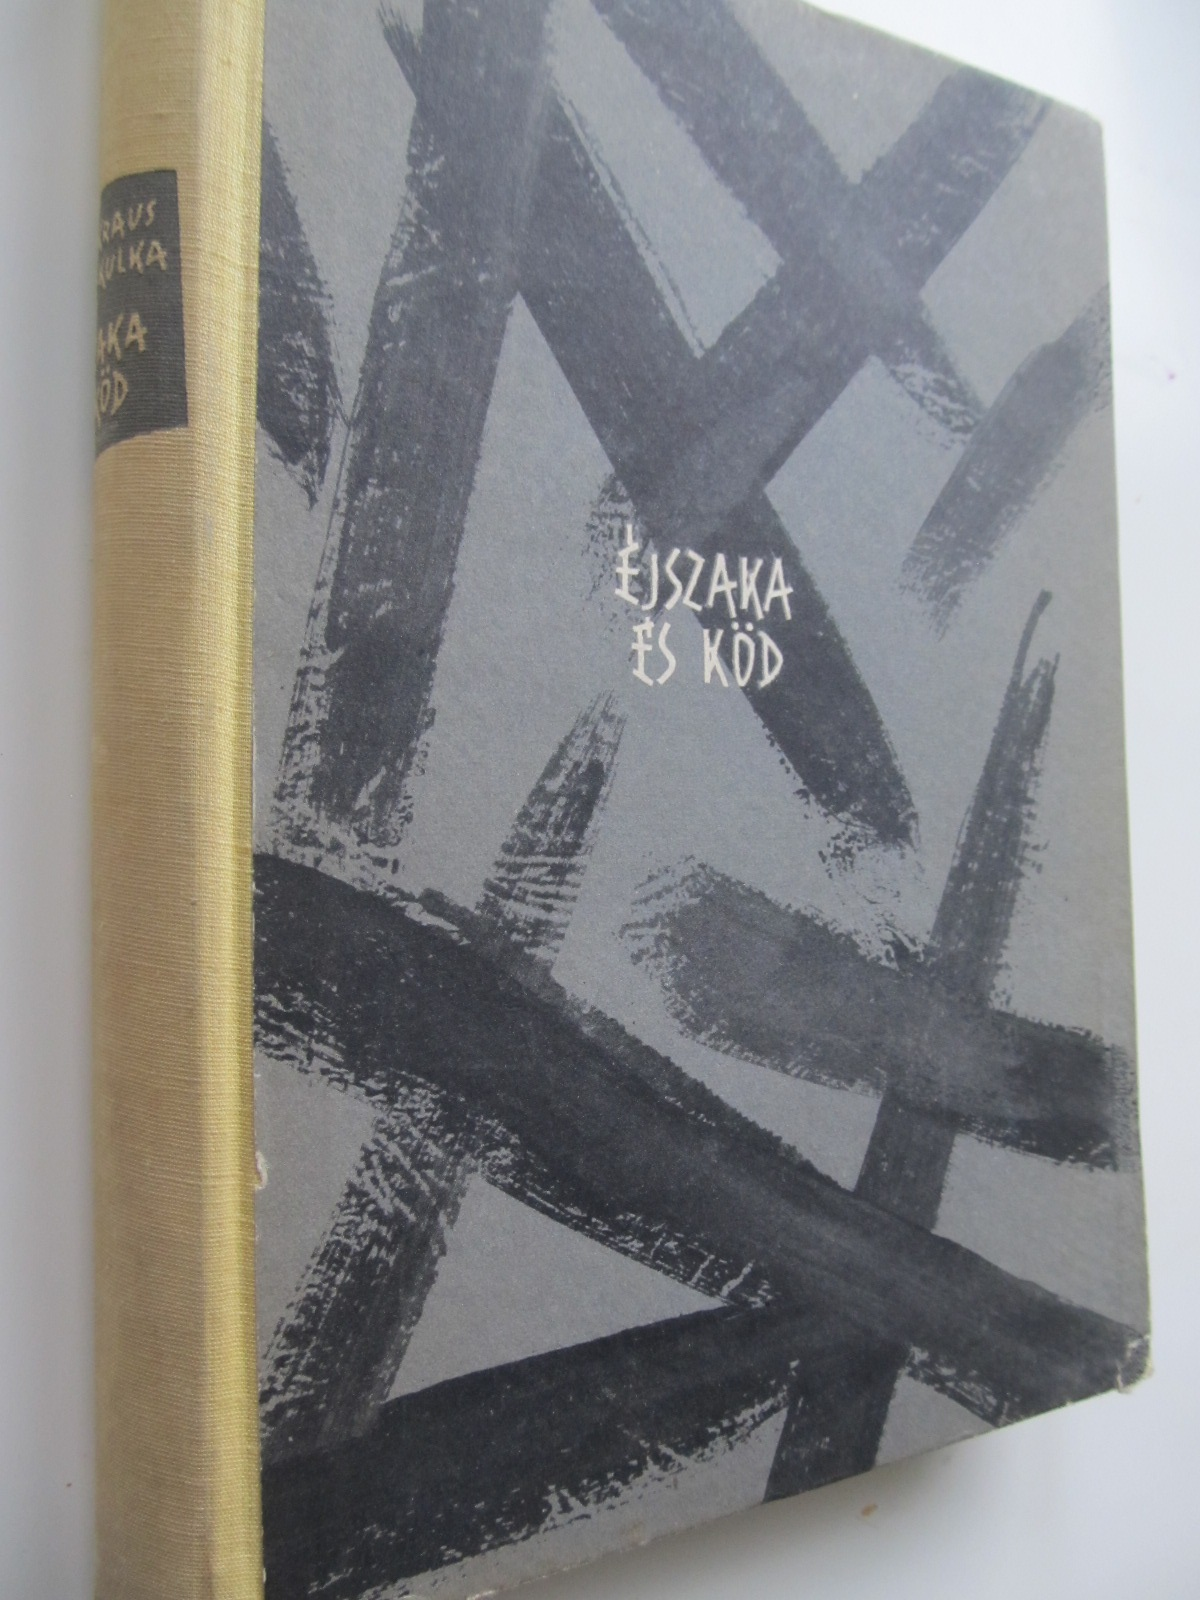 Ejszaka es kod - Ota Kraus - Erich Kulka | Detalii carte